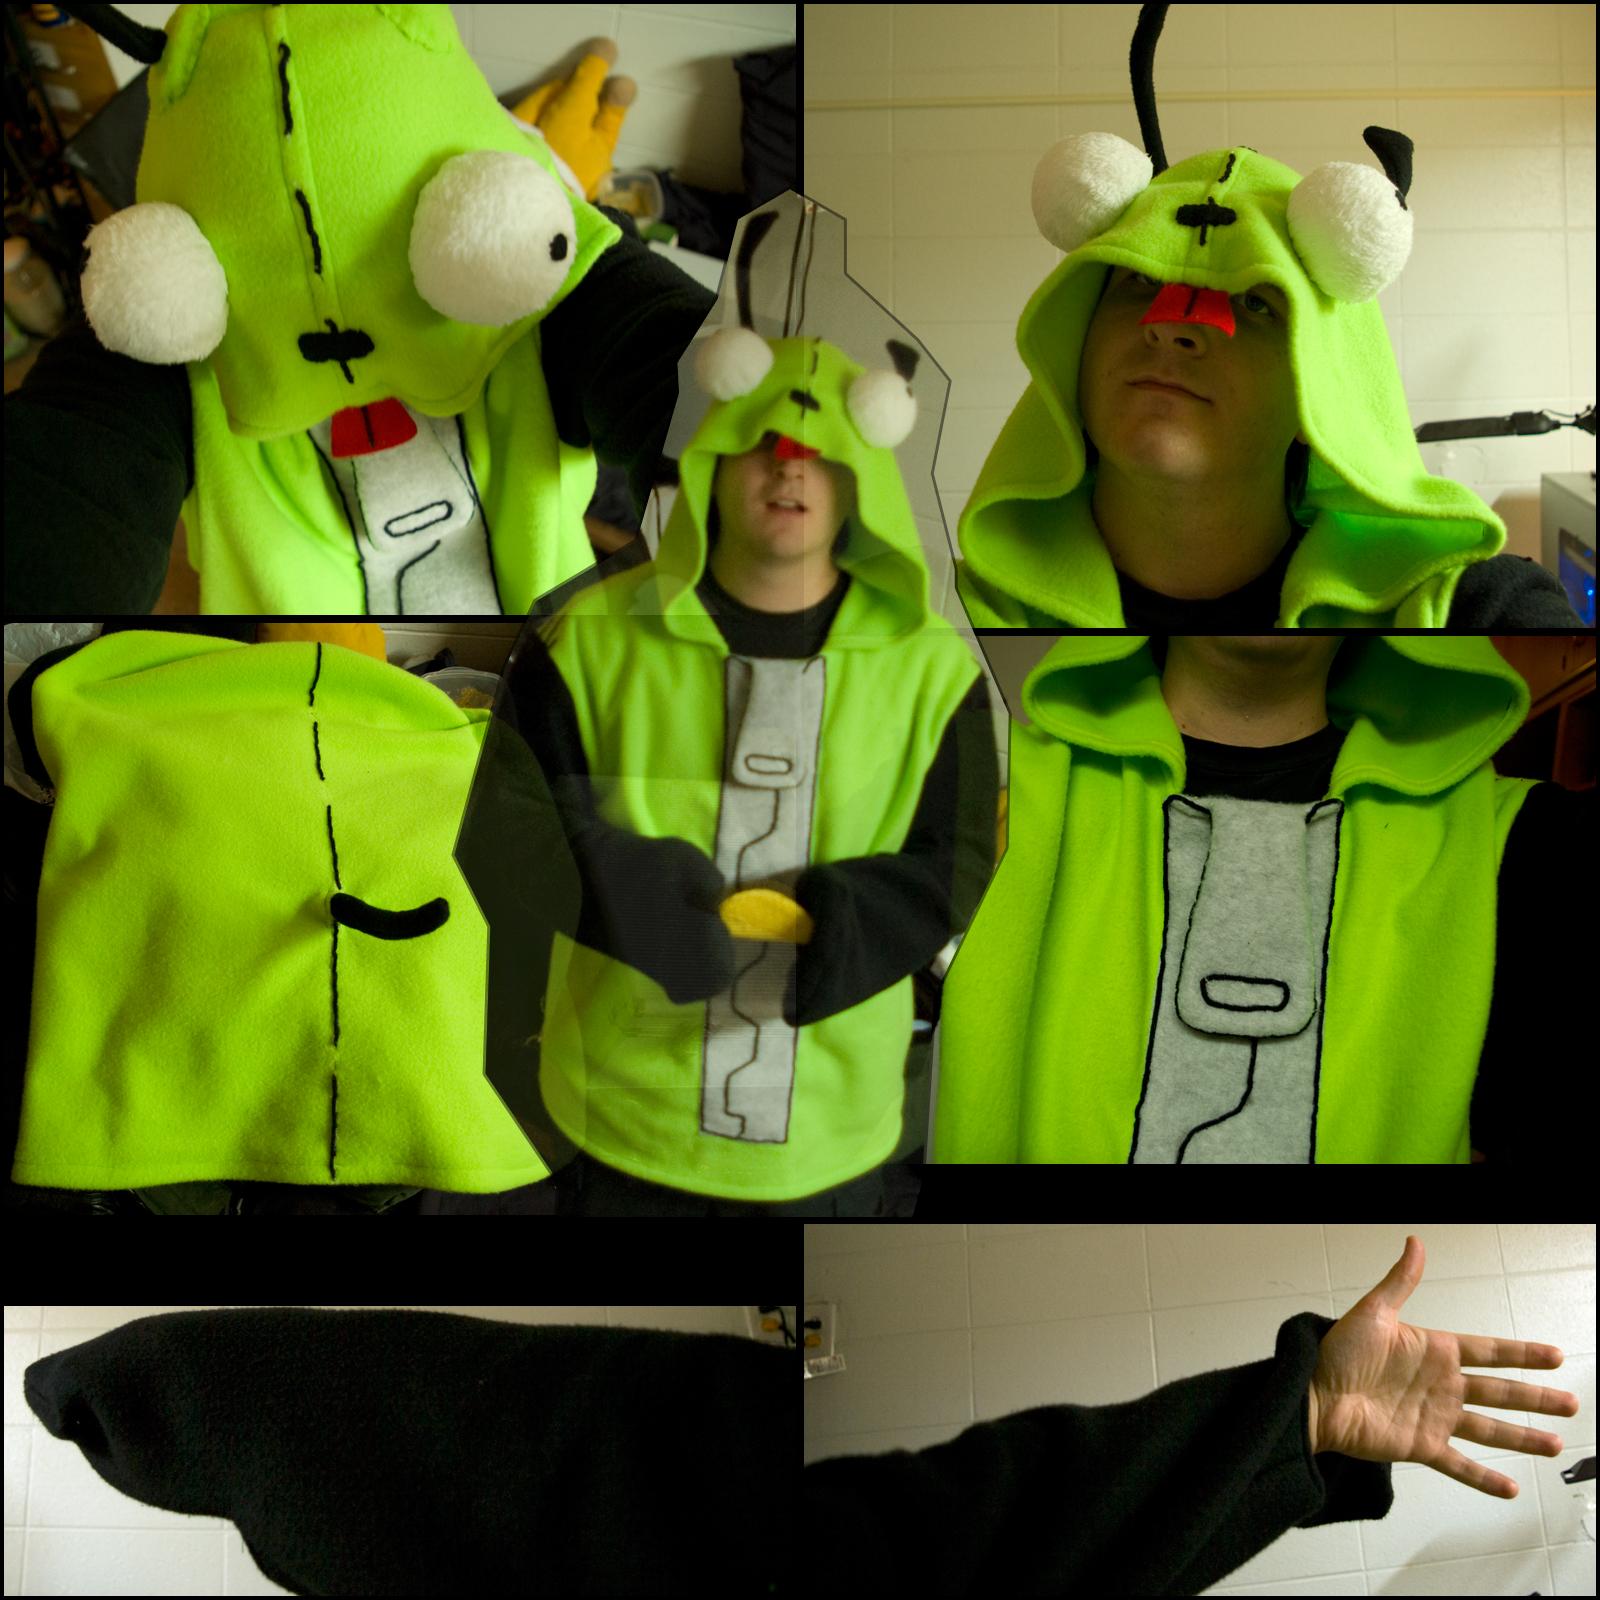 http://fc05.deviantart.net/fs19/f/2007/294/b/2/GIR_Halloween_Costume_Hoodie_by_falcoln0014.jpg